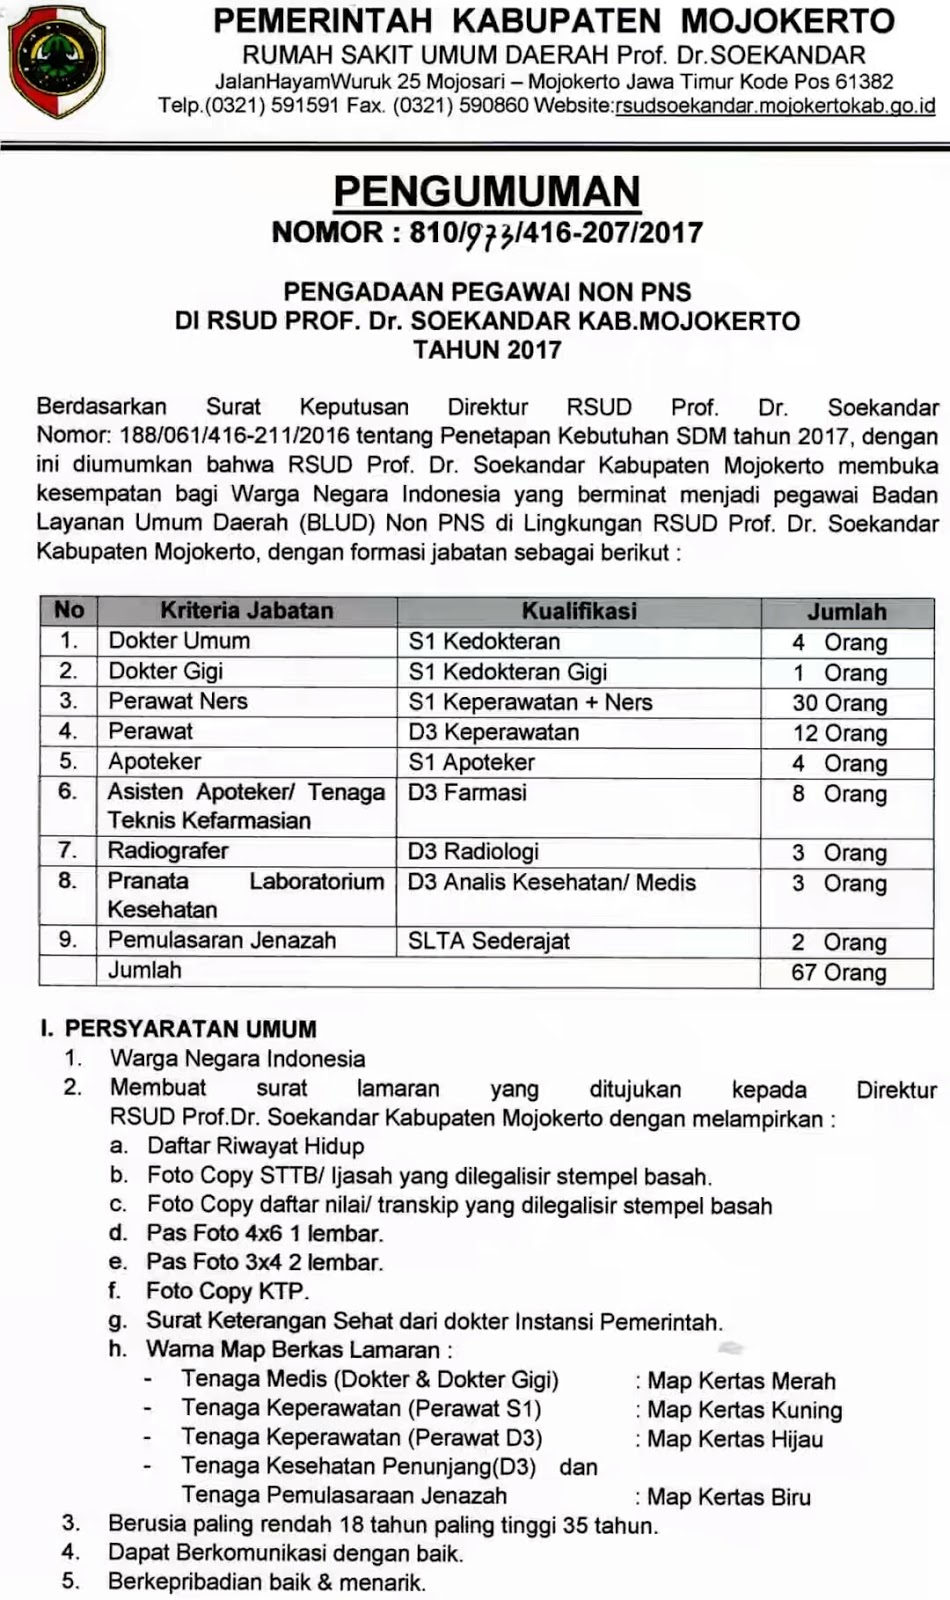 Lowongan Kerja Non PNS di RSUD Prof. Dr. Soekandar Kab. Mojokerto Tahun 2017